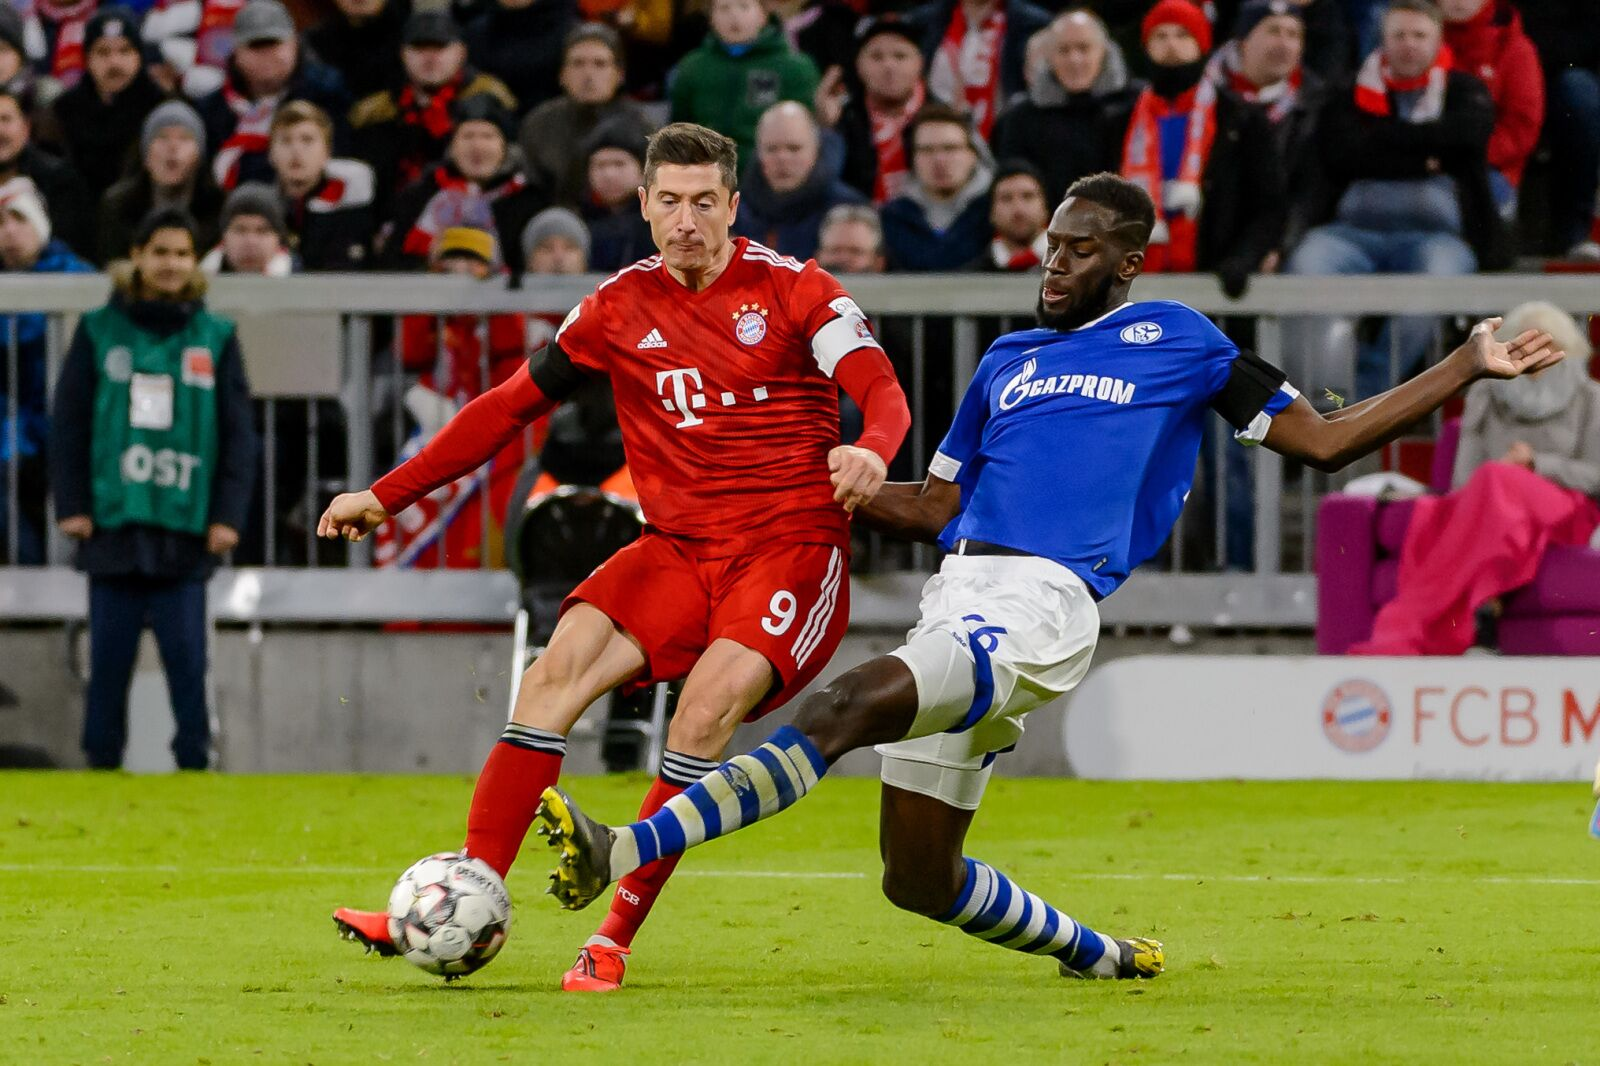 Bayern Vs Schalke 2021